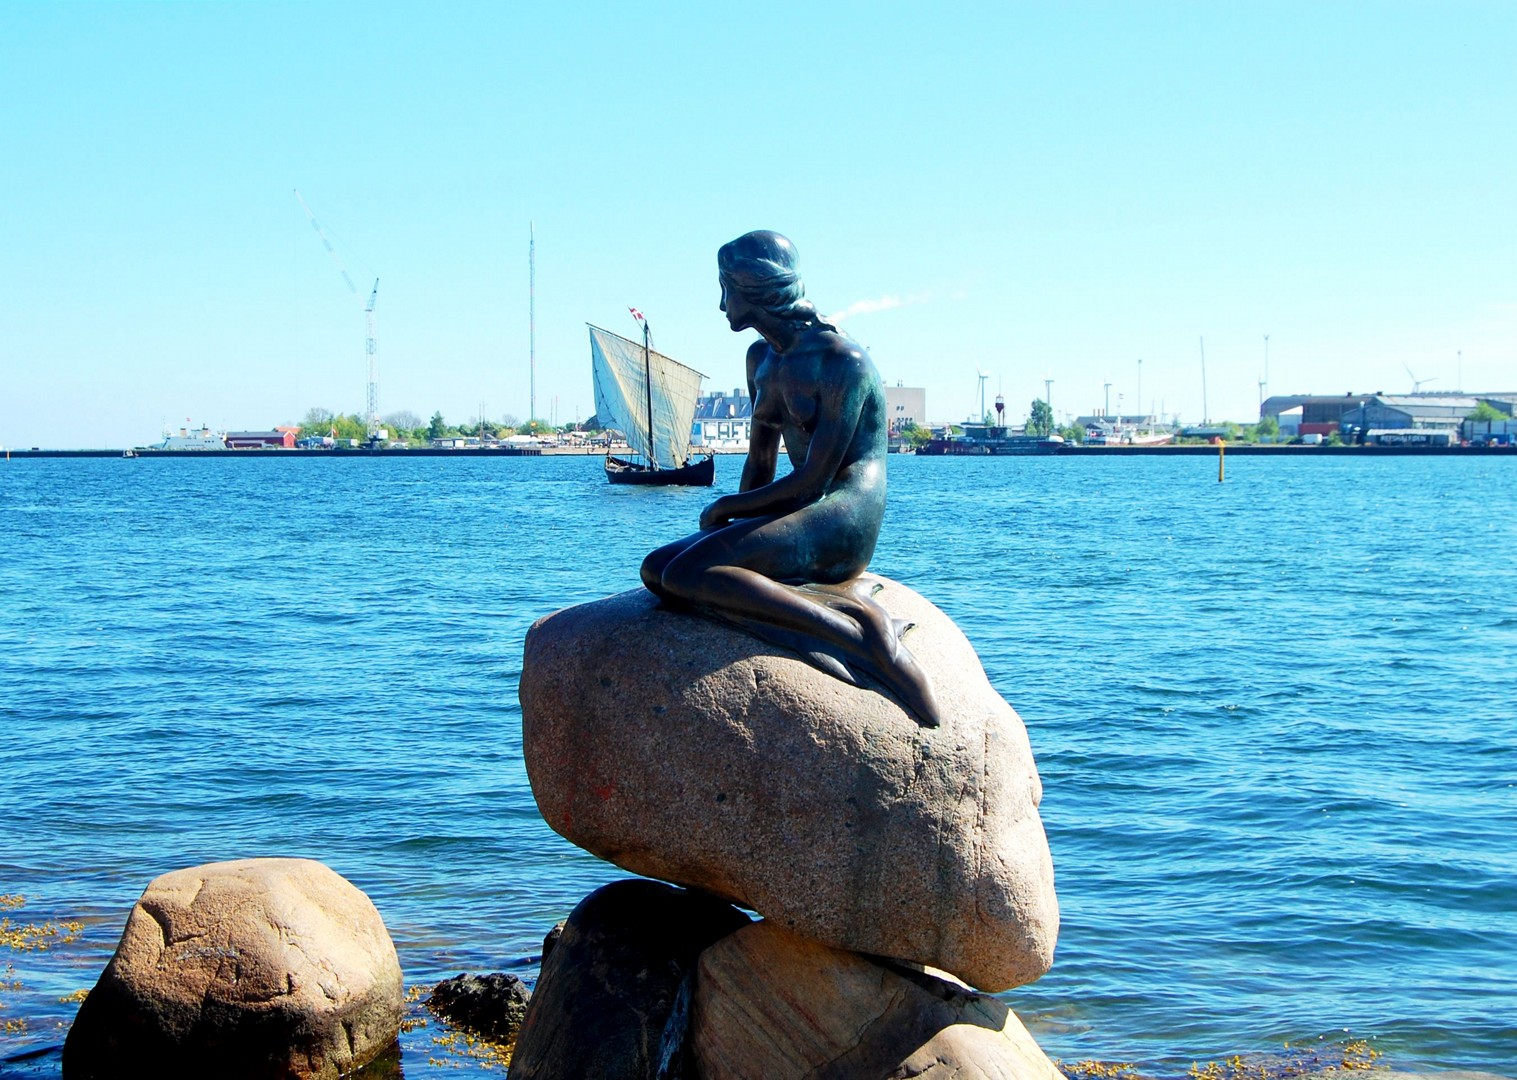 little-mermaid-statue-copenhagen-denmark-family-biking.jpg - NEW! Denmark - Zooming Through Zealand - Family Cycling